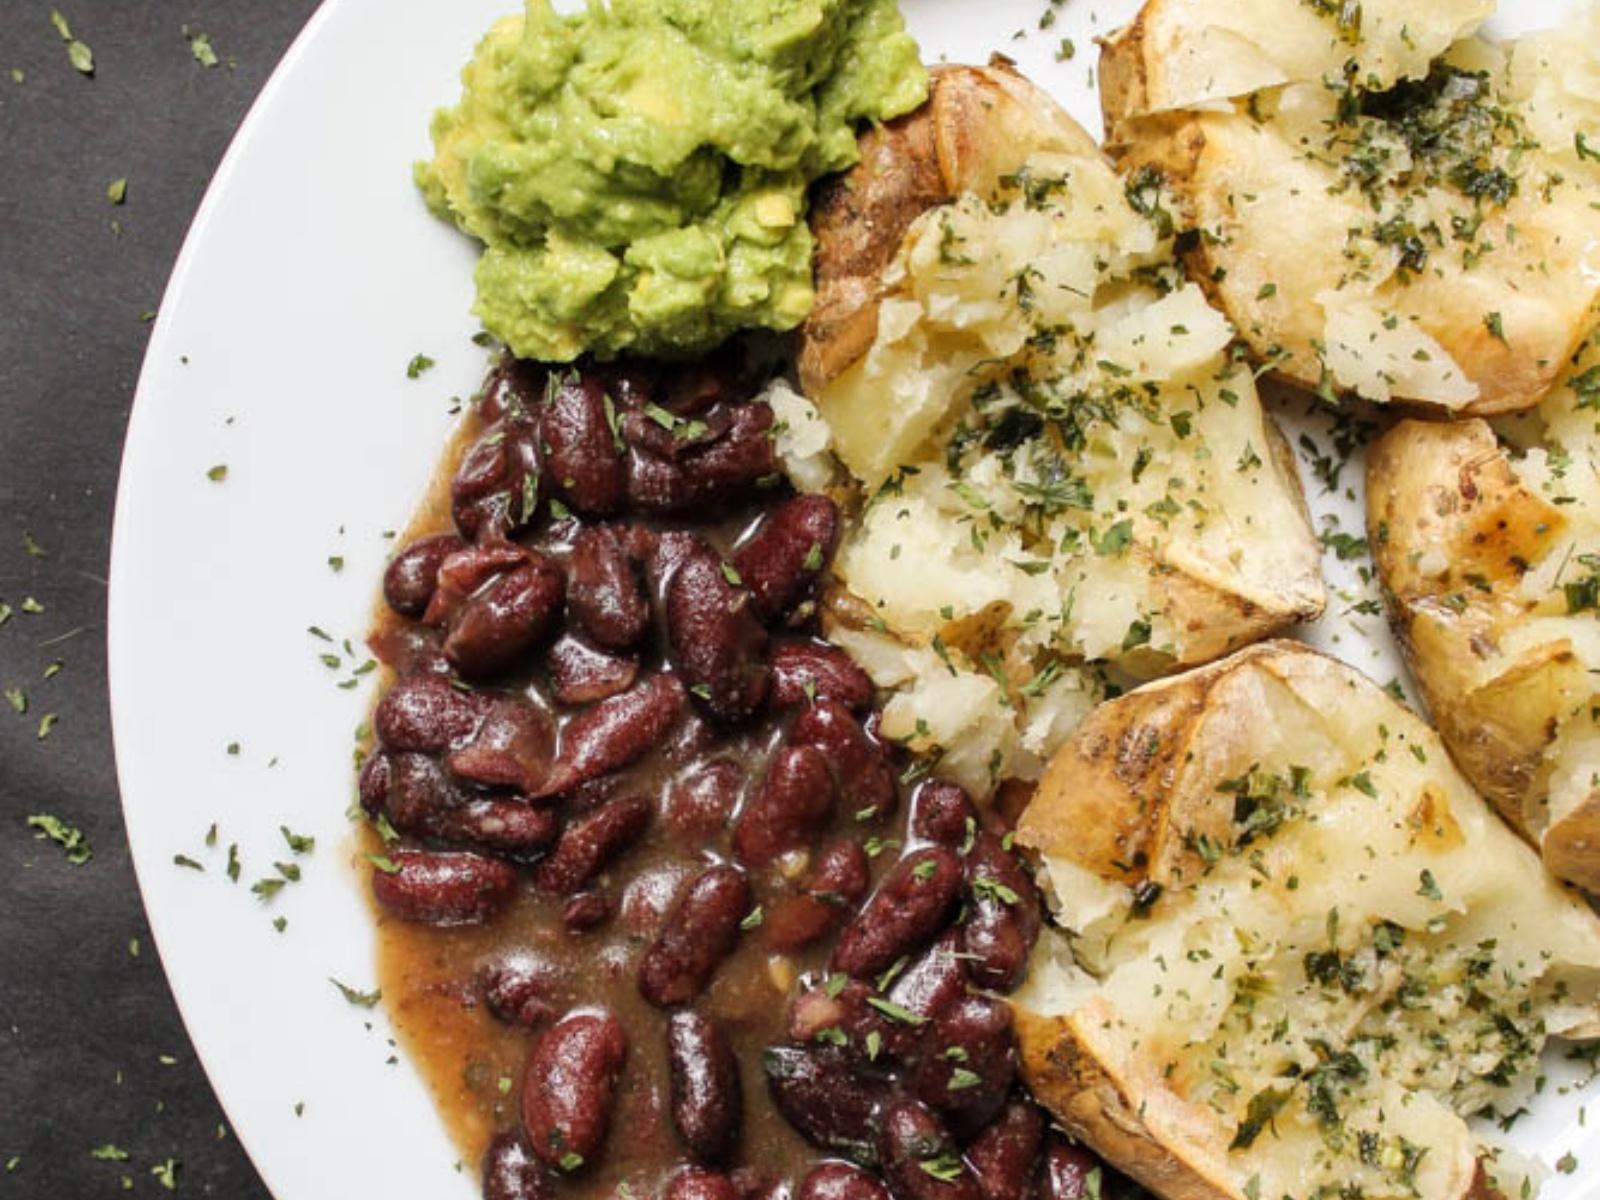 Vegan Garlic Smashed Potatoes with Baked Beans